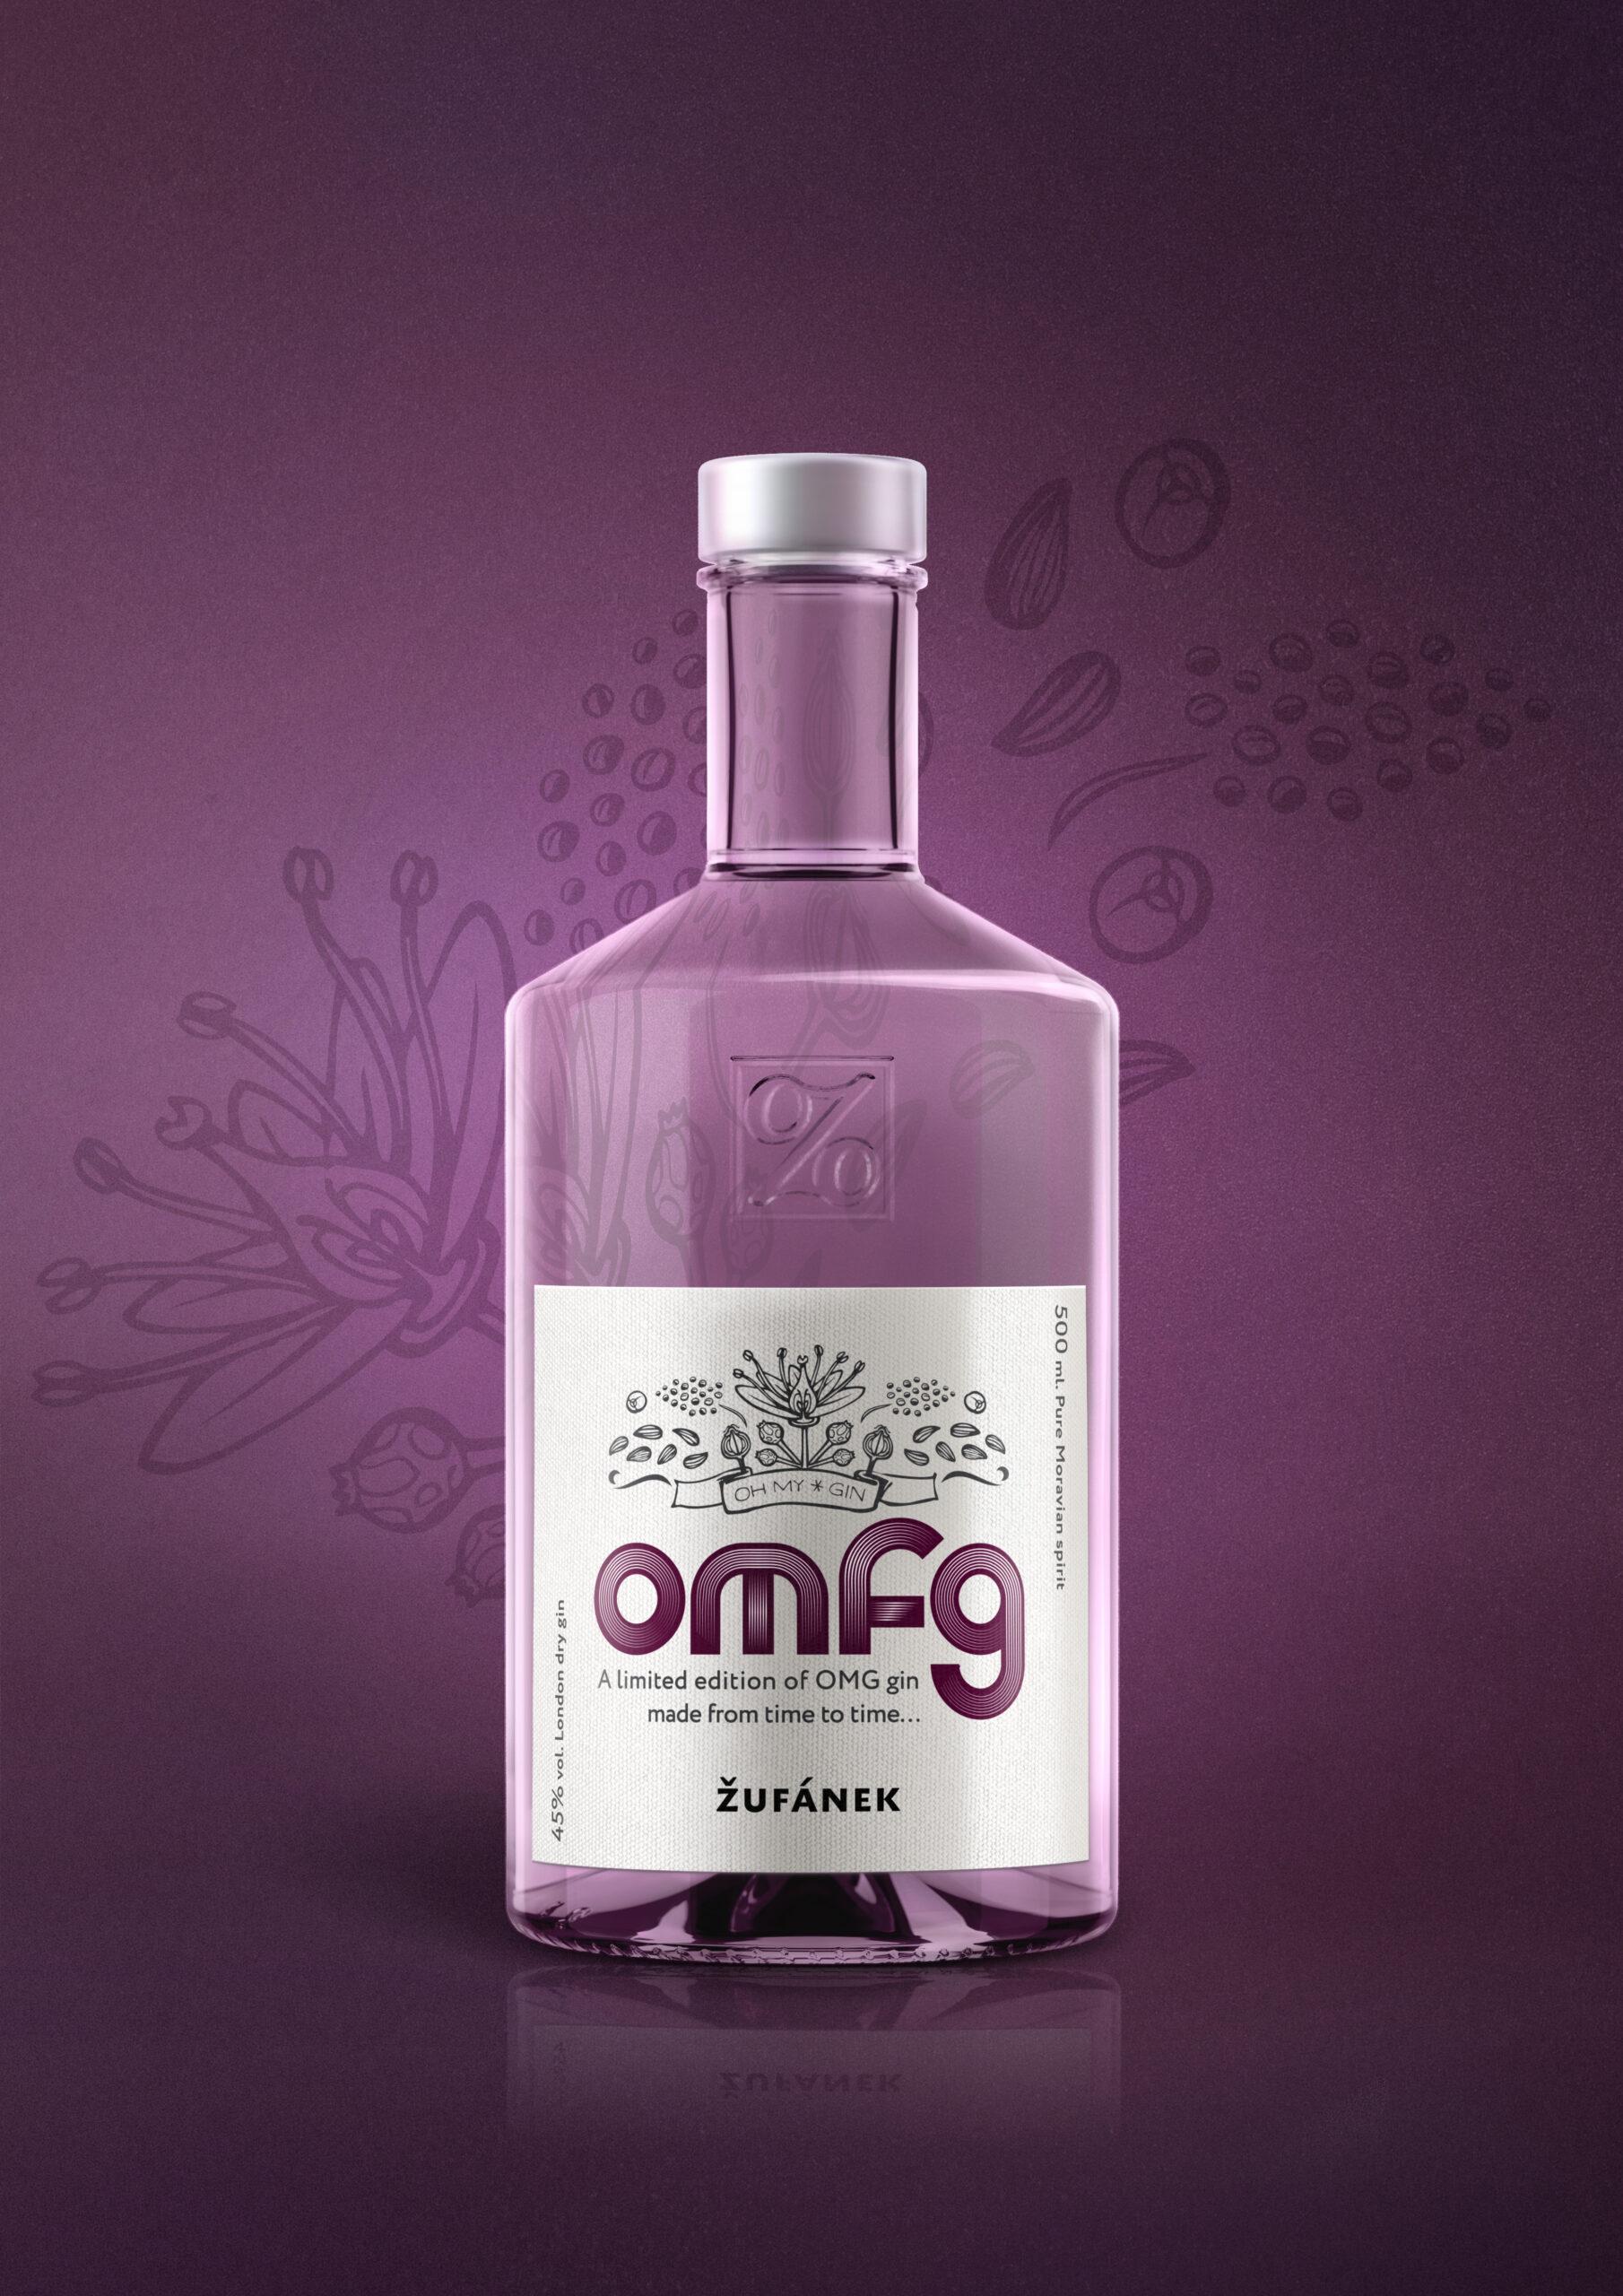 OMFG gin visual